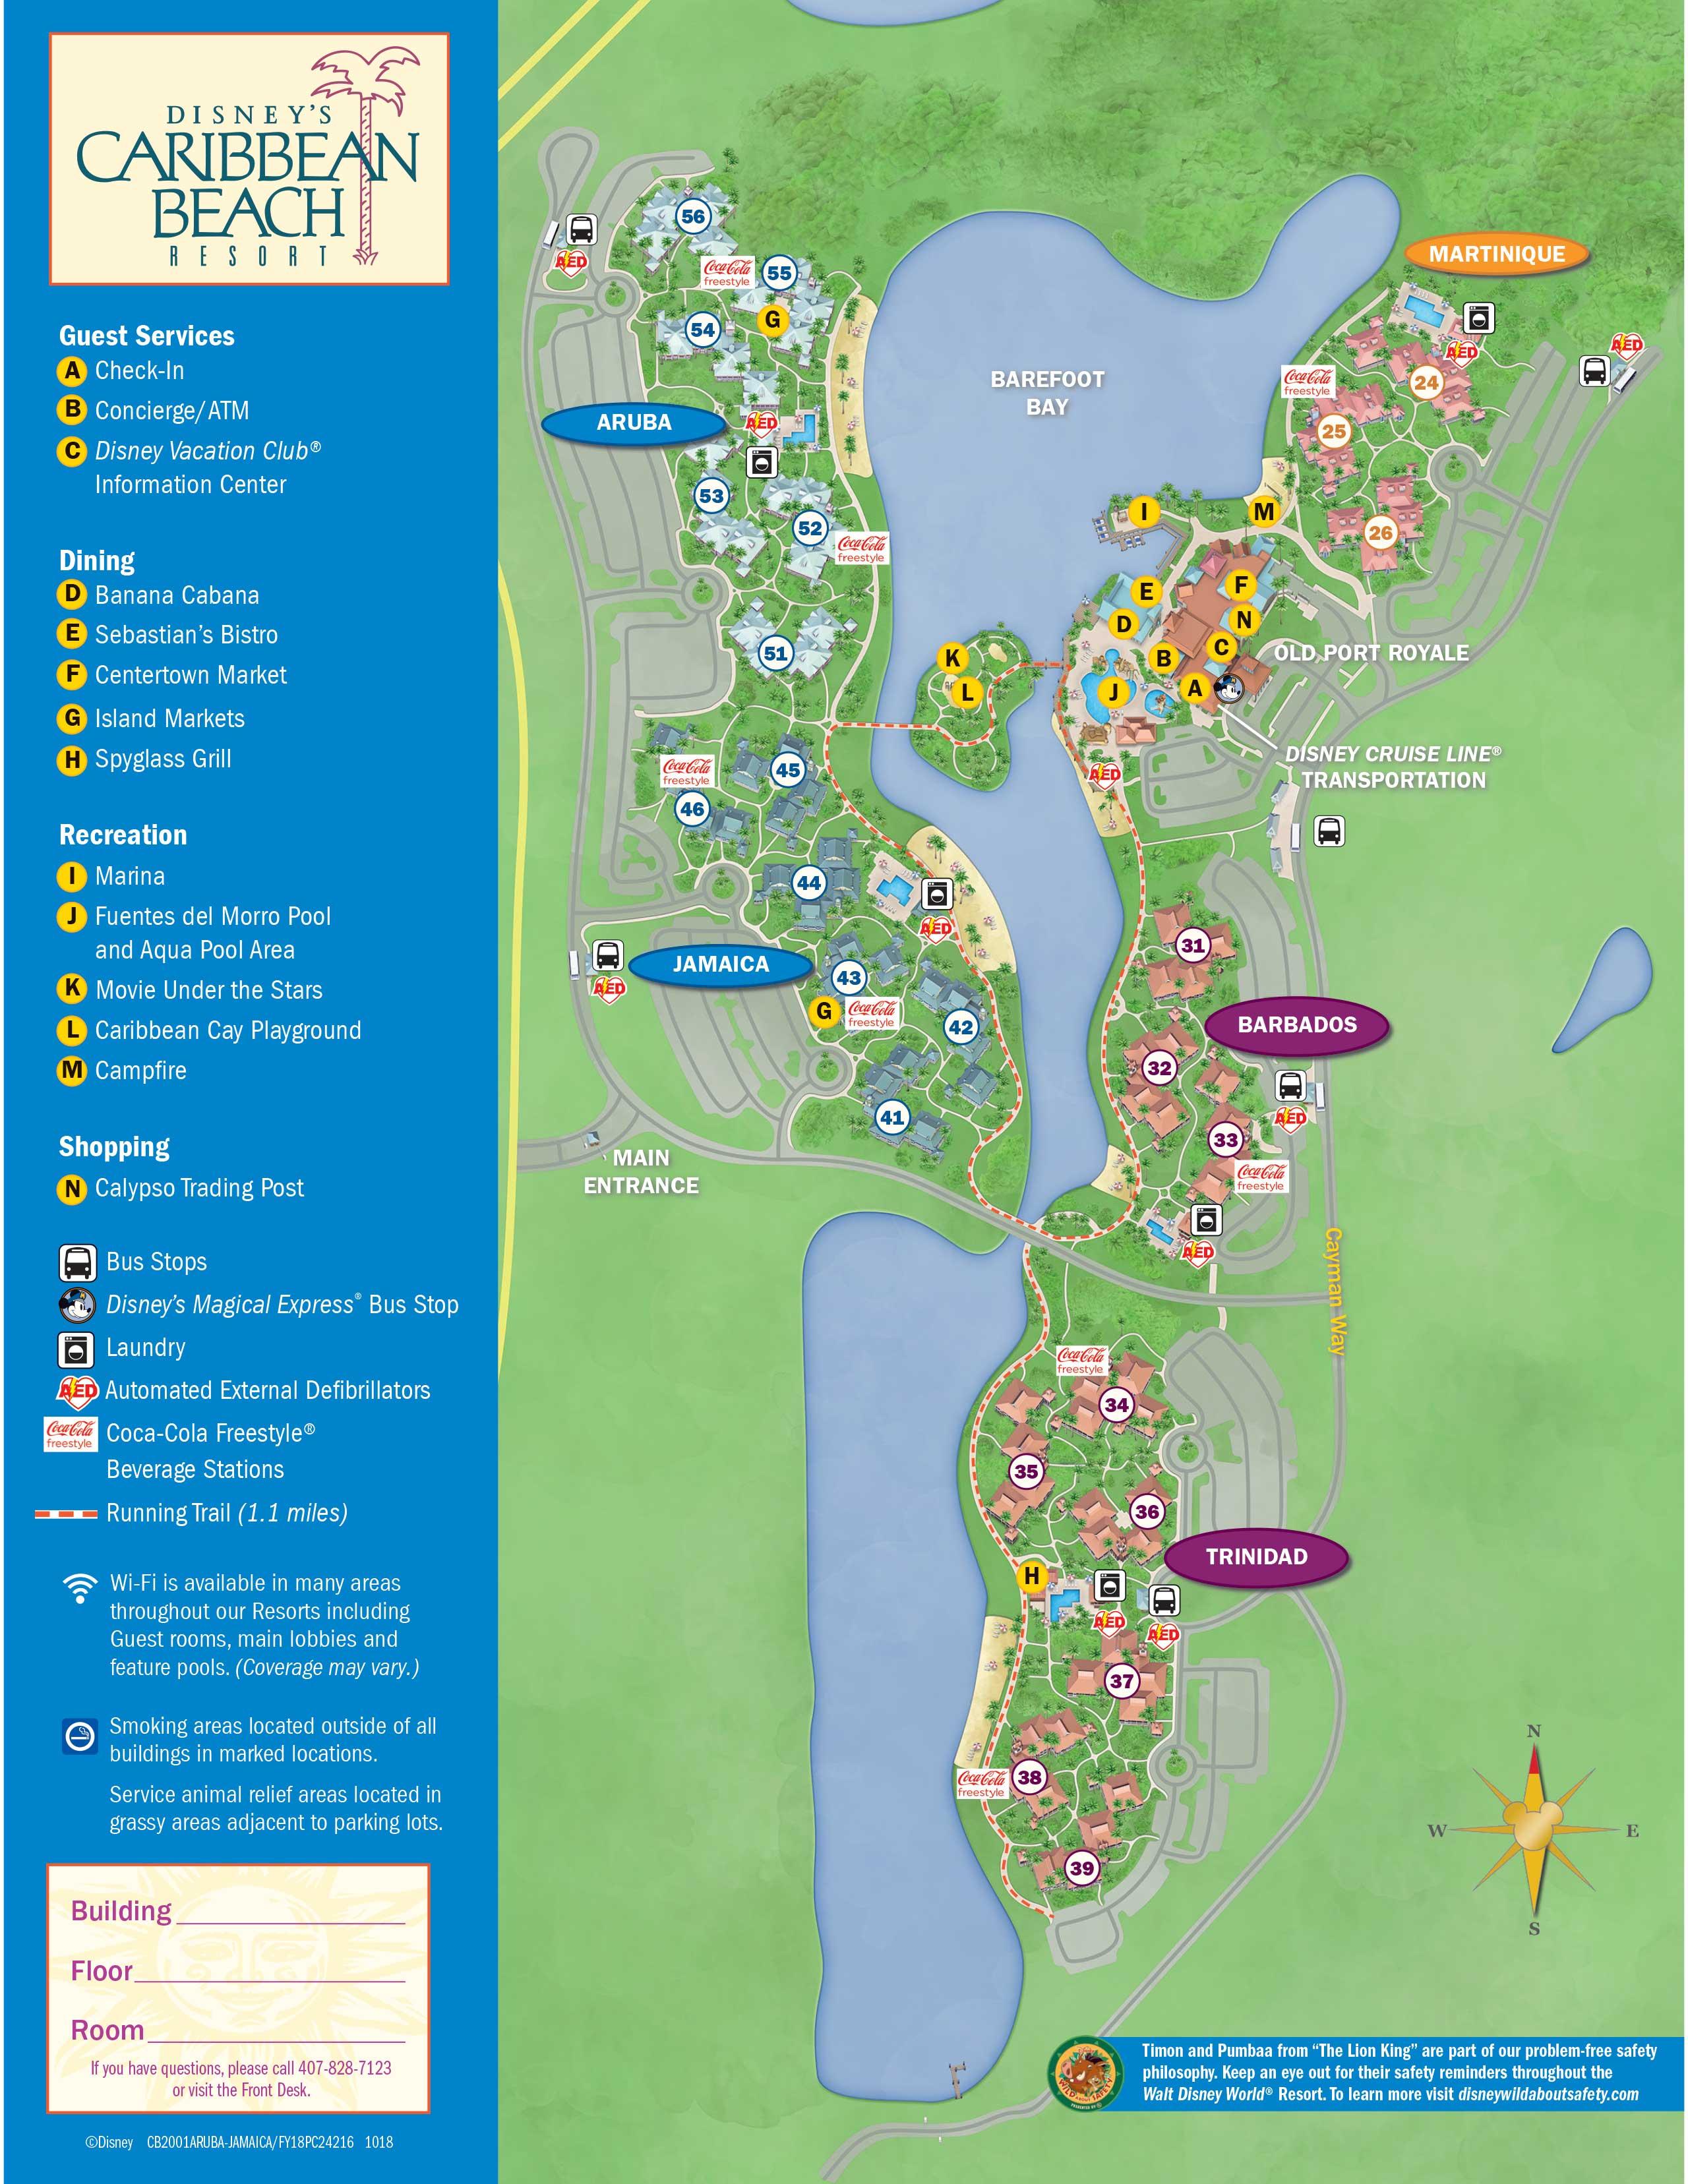 Disney Caribbean Beach Resort Map PHOTOS   New guide map for Disney's Caribbean Beach Resort Disney Caribbean Beach Resort Map